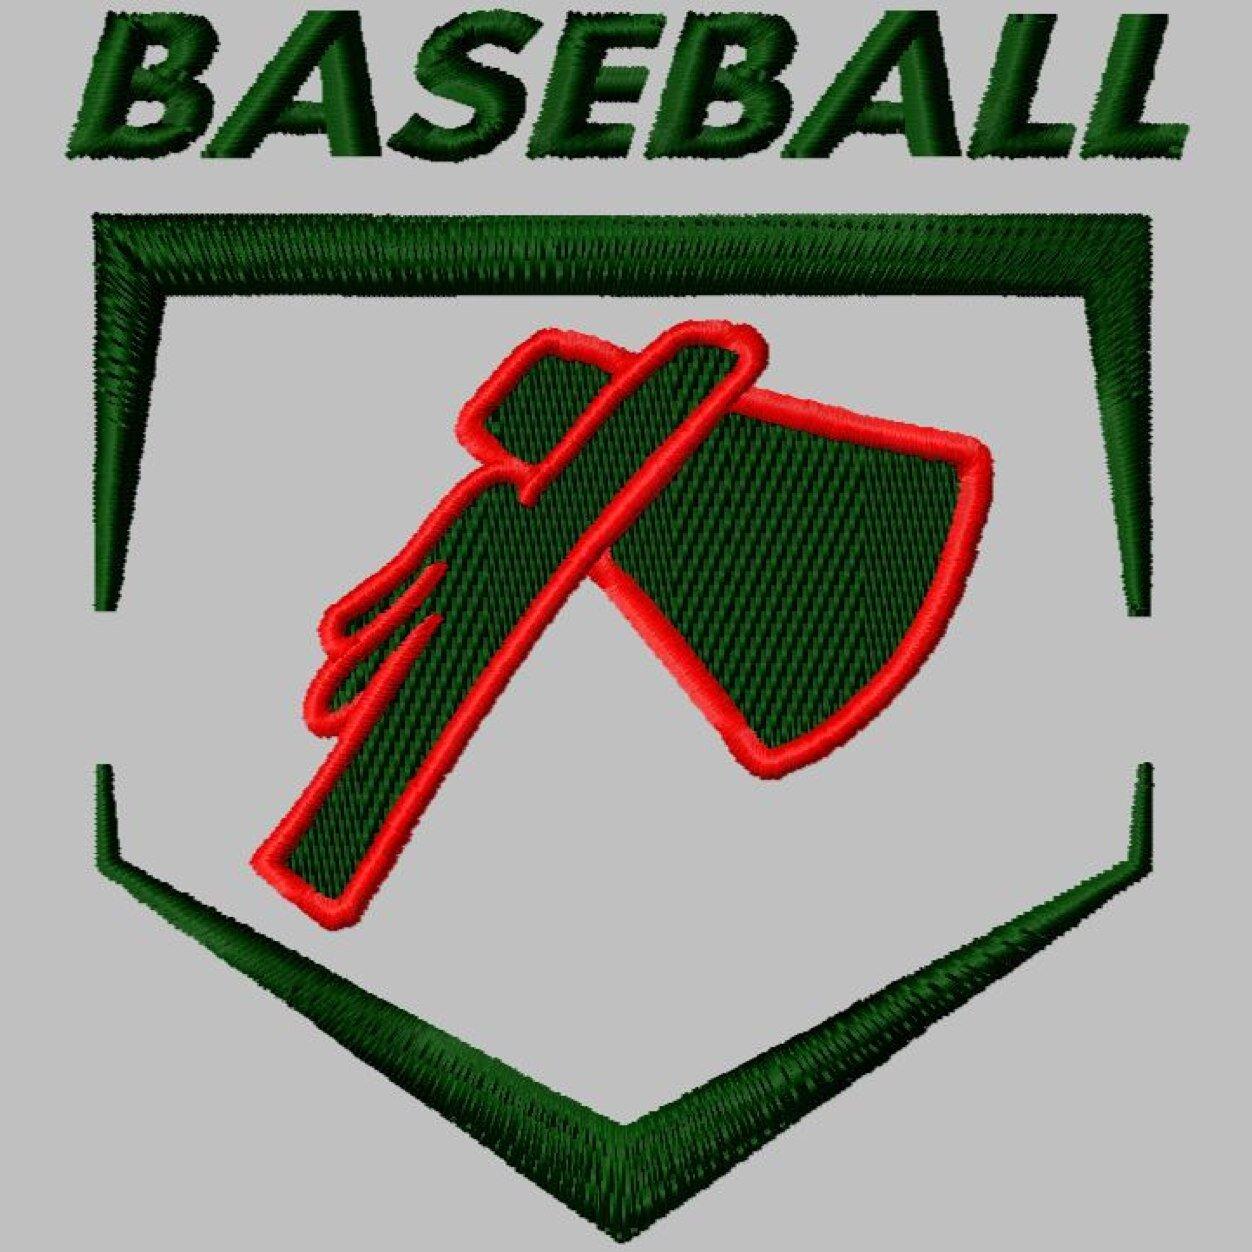 Railer Baseball